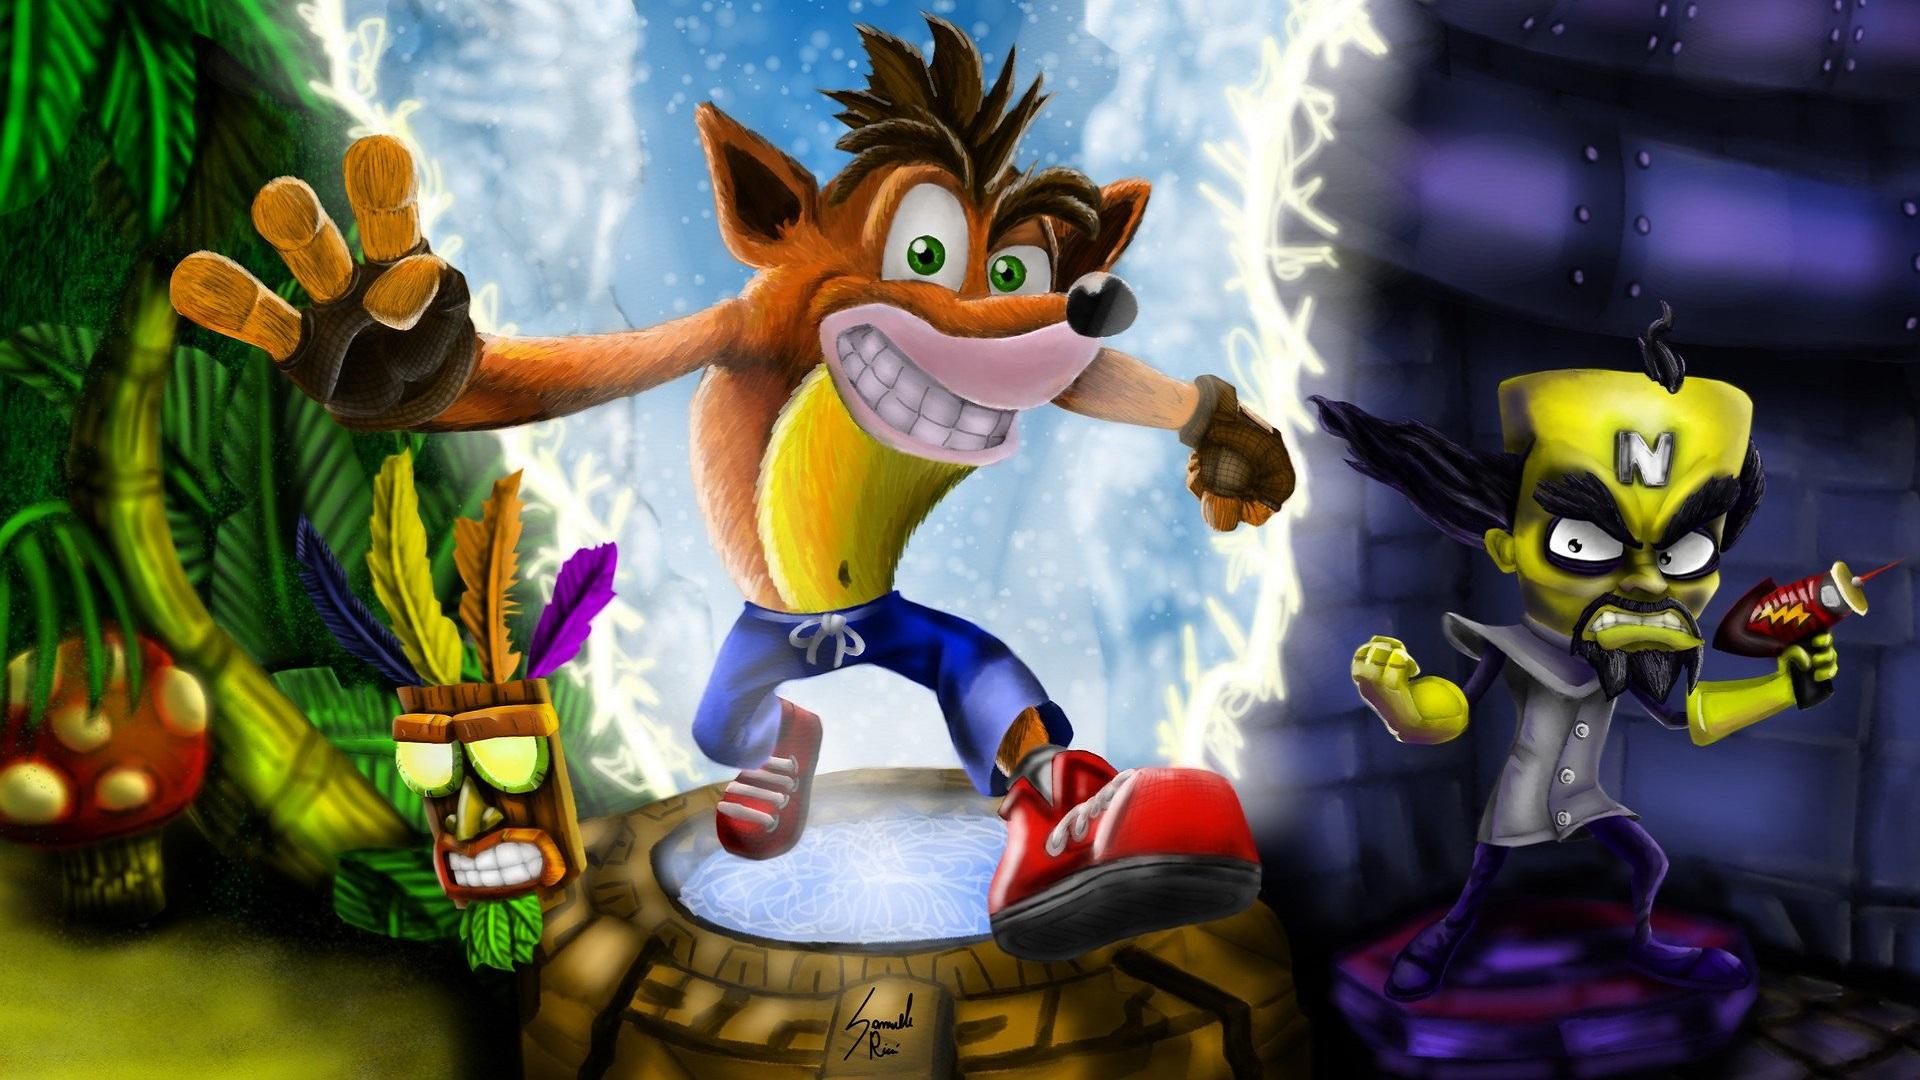 Sonic Wallpaper Hd 3d Crash Bandicoot N Sane Trilogy Wallpapers Read Games